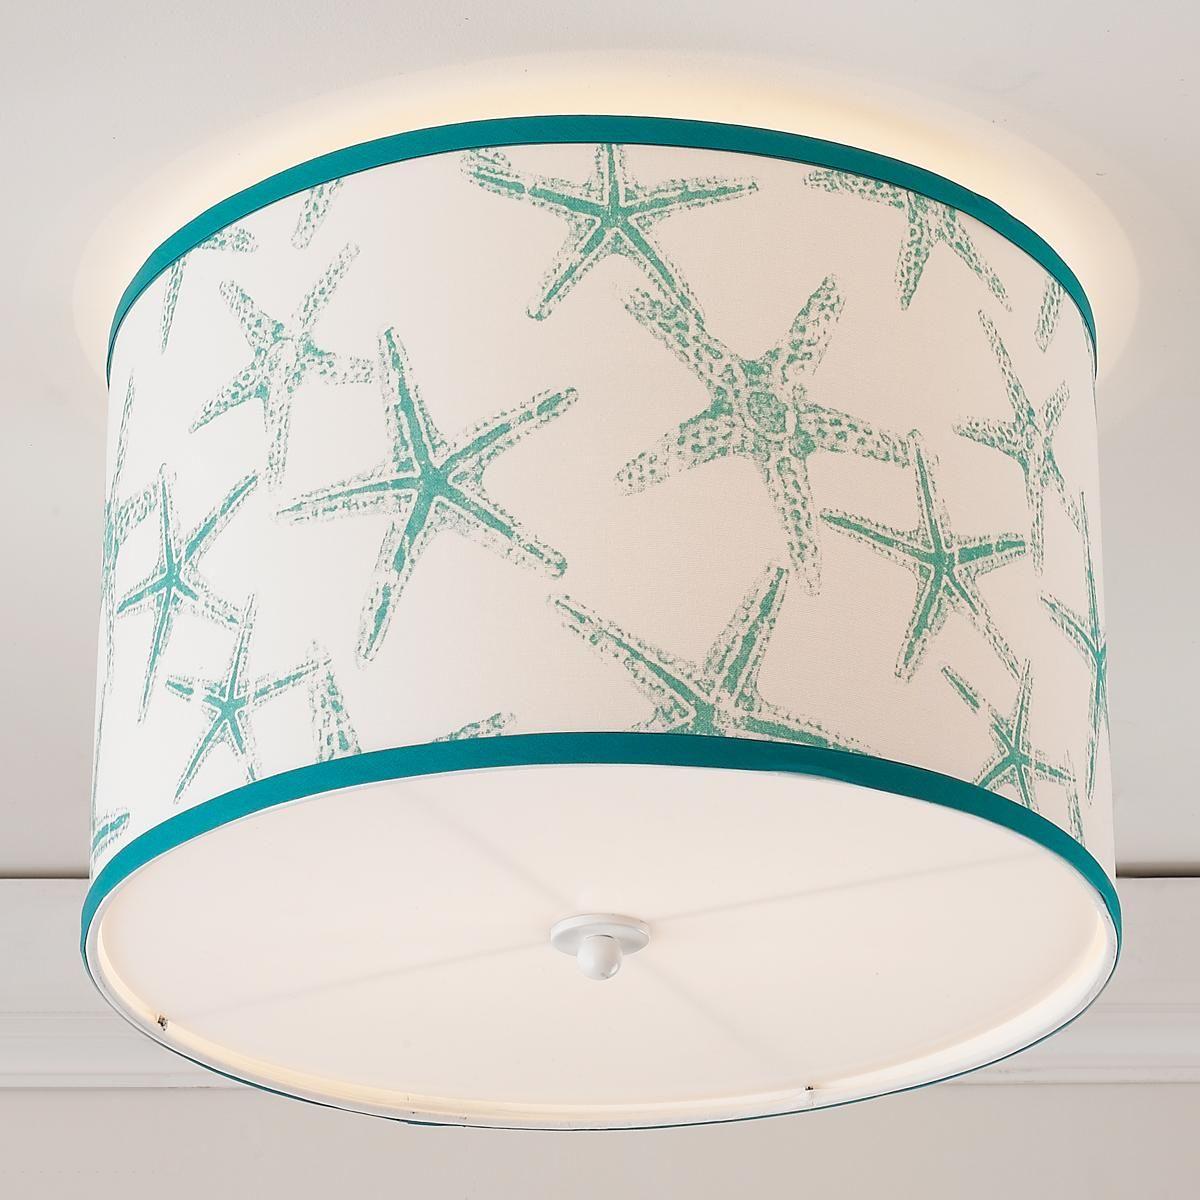 Starfish Drum Shade Ceiling Light | Drum shade, Starfish and Drums